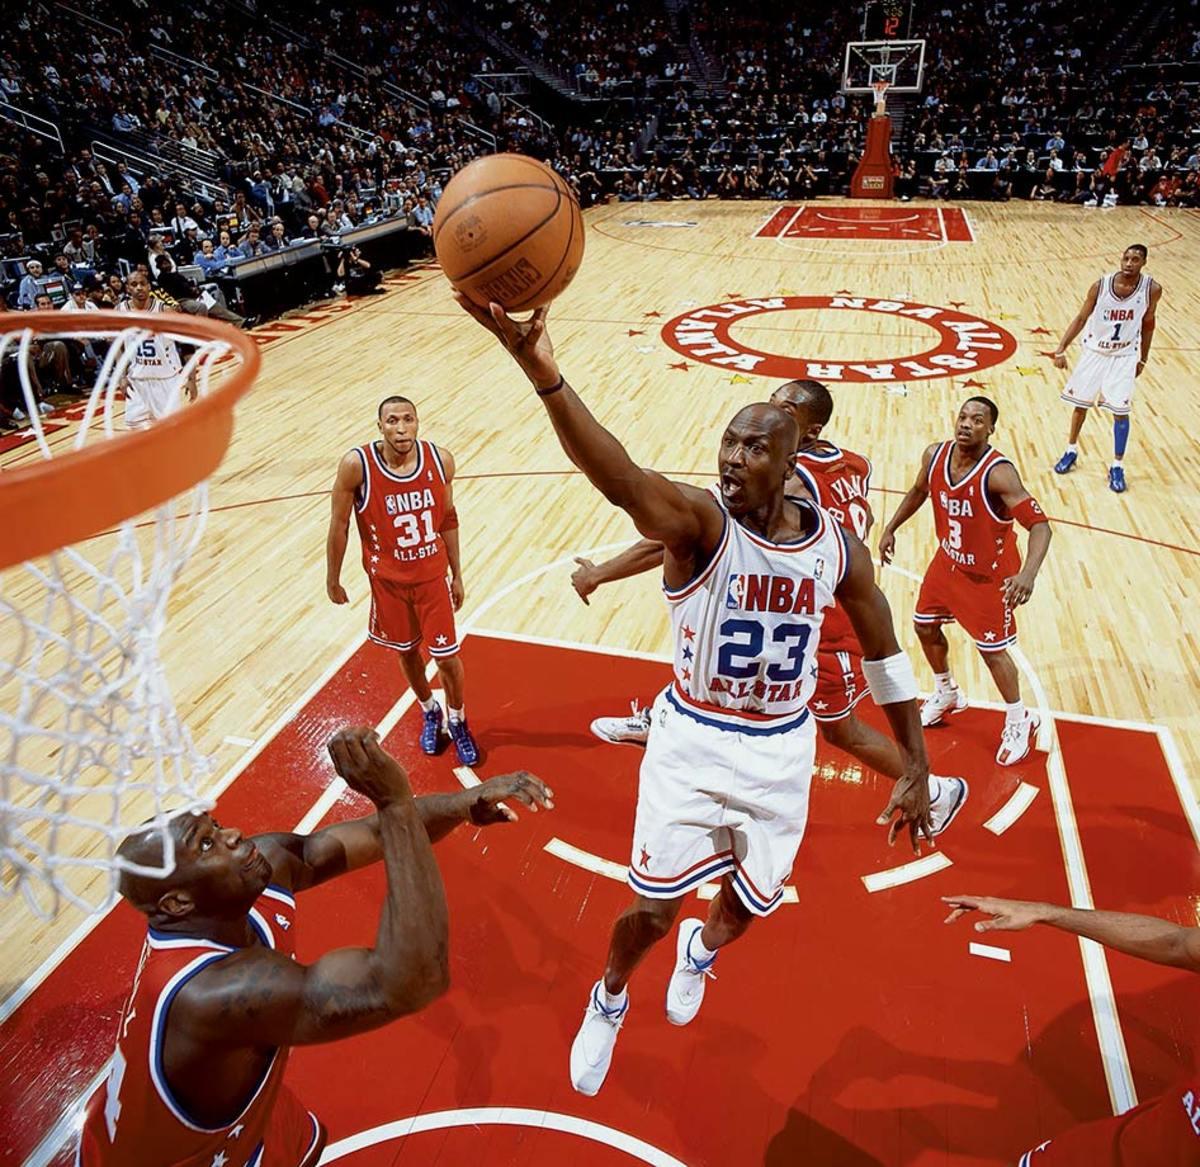 2003-0209-Michael-Jordan-Shaquille-O'Neal-001284056.jpg